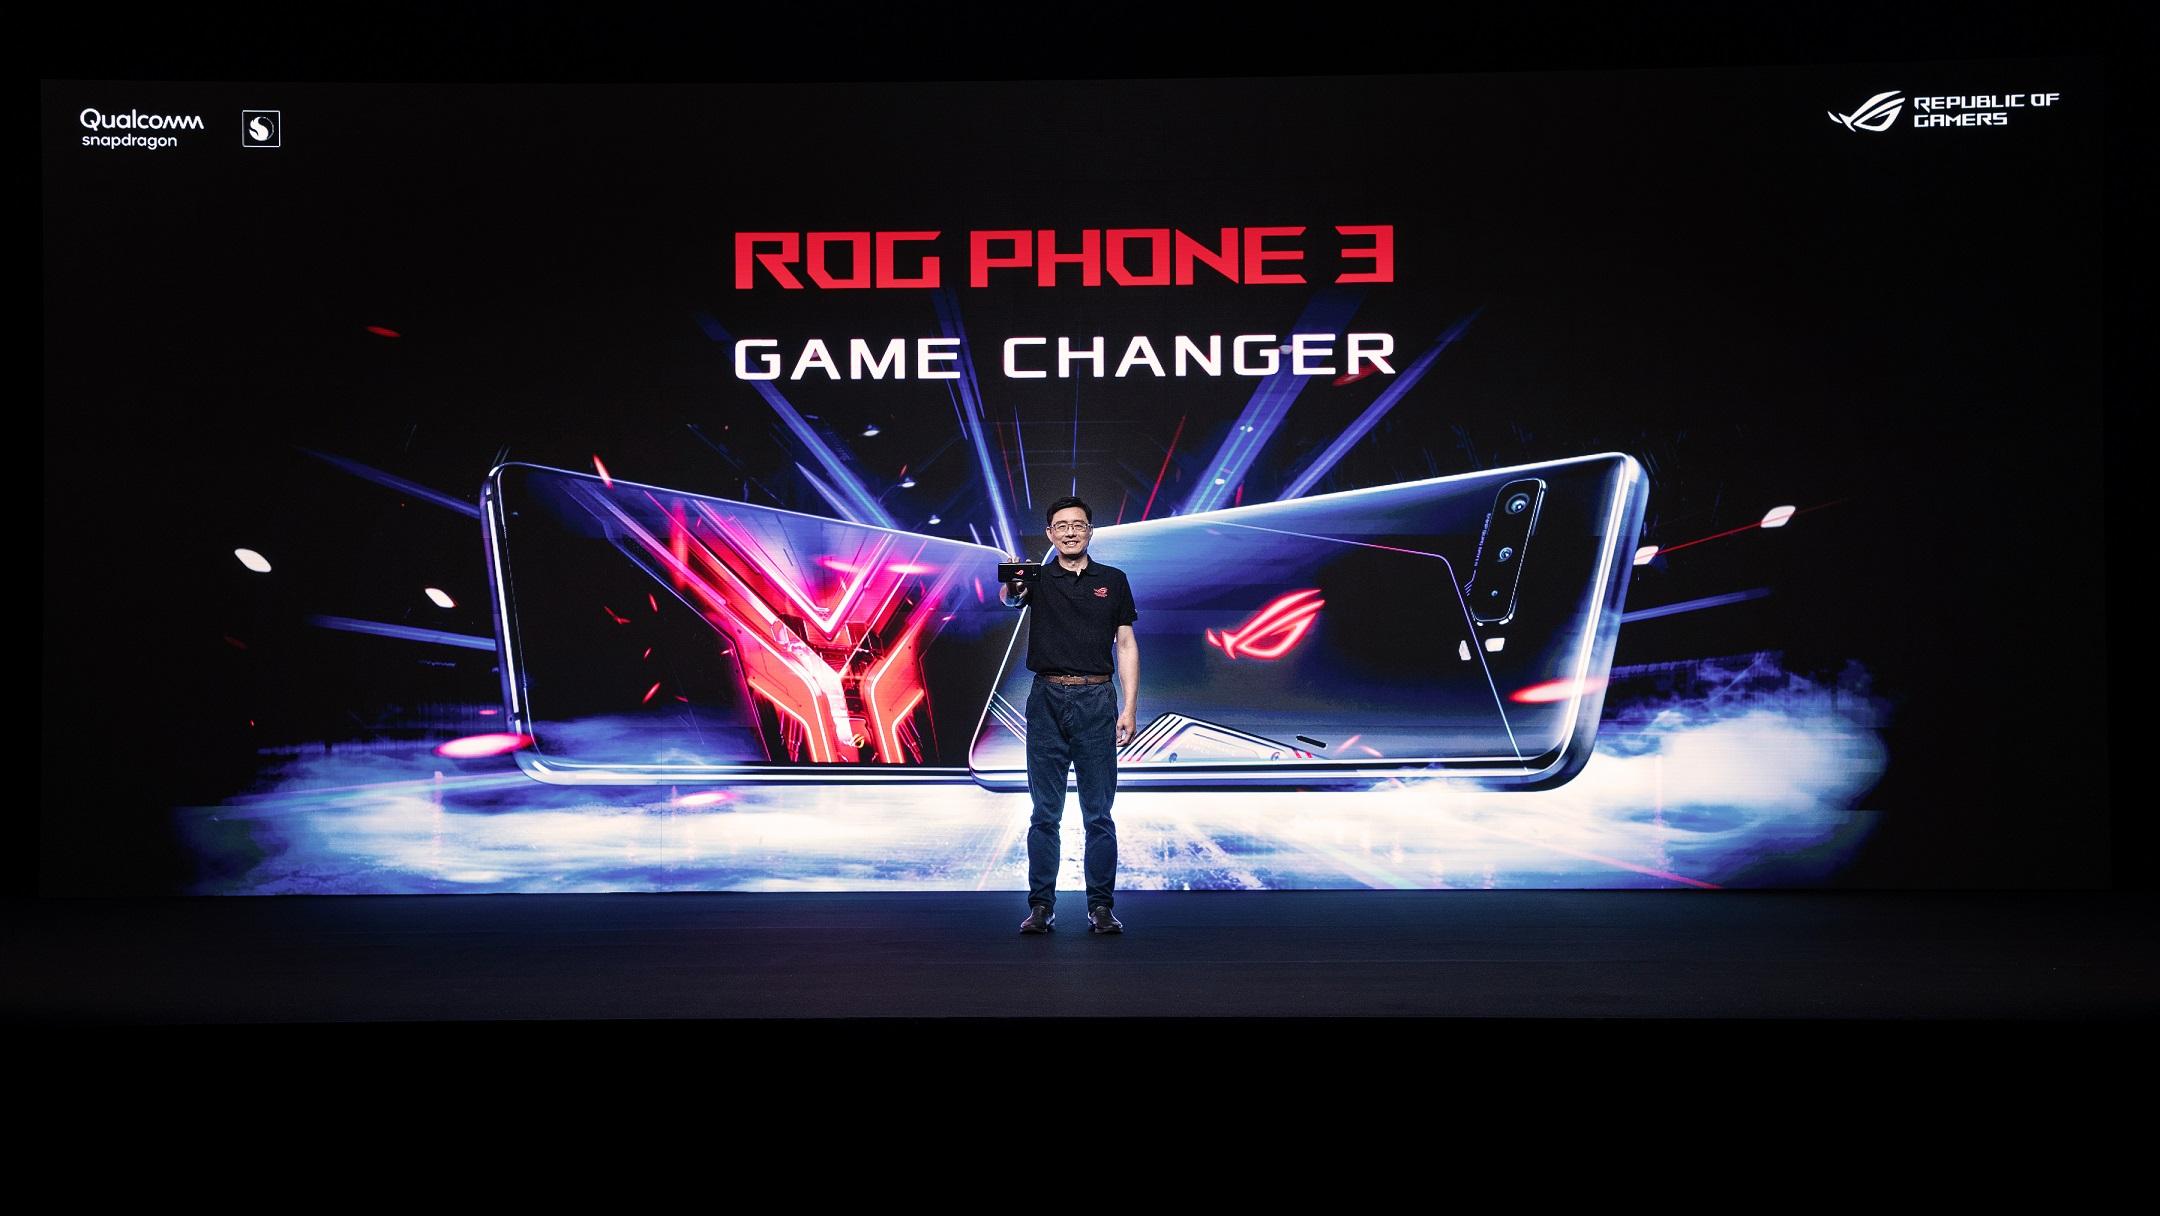 ROG 2020 Game Changer》線上新品發表會中率先揭露新一代ROG Phone 3電競手機。